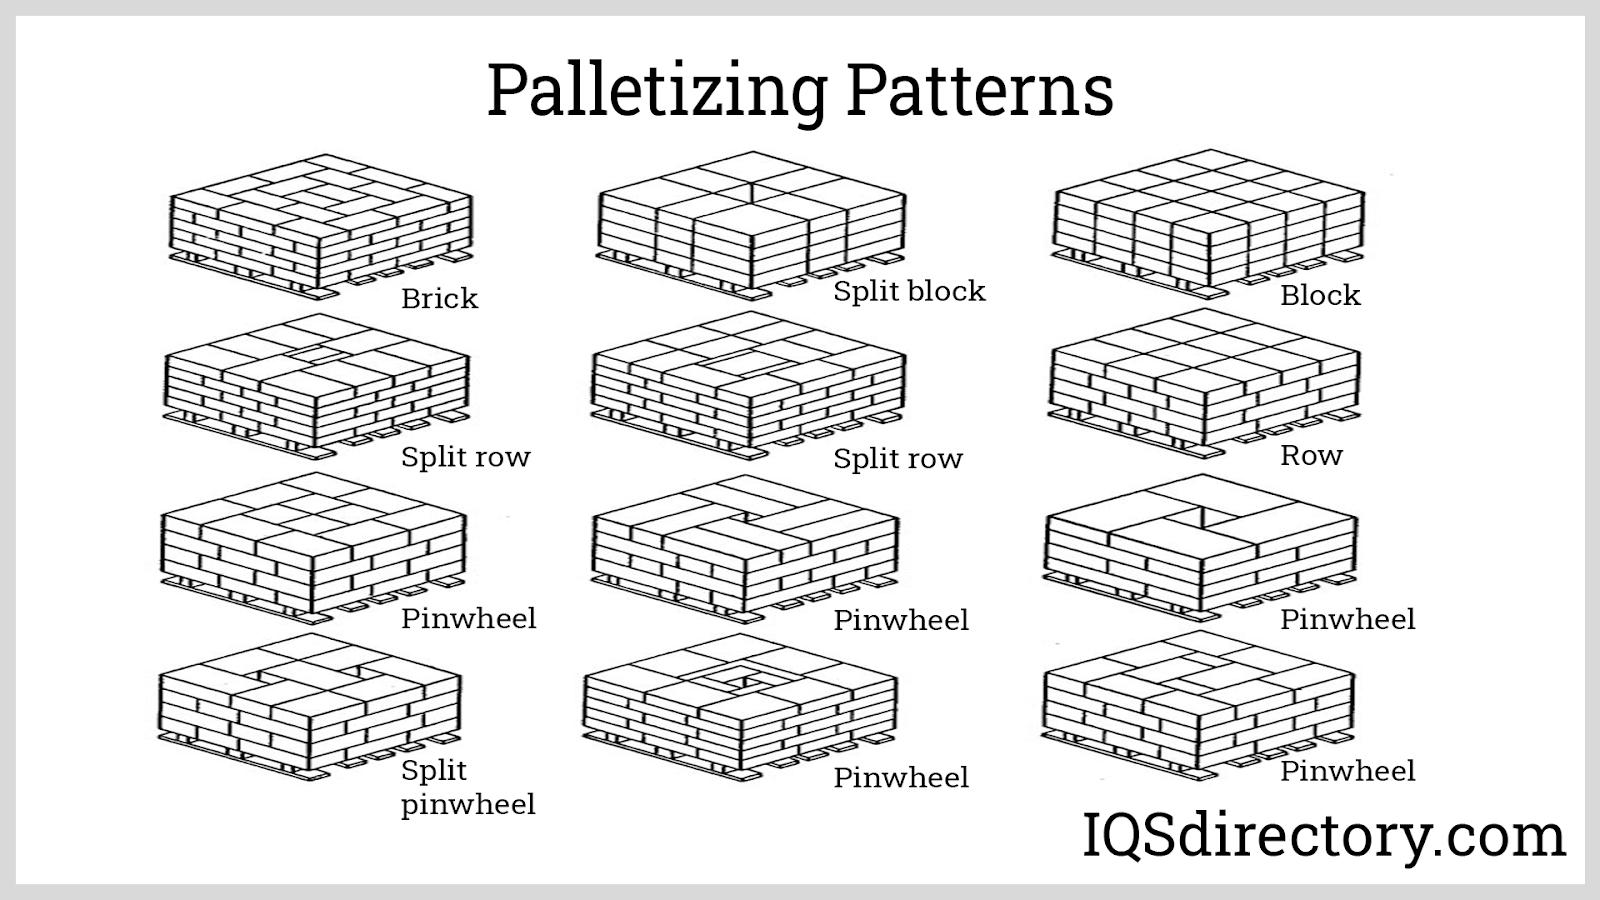 Palletizing Patterns